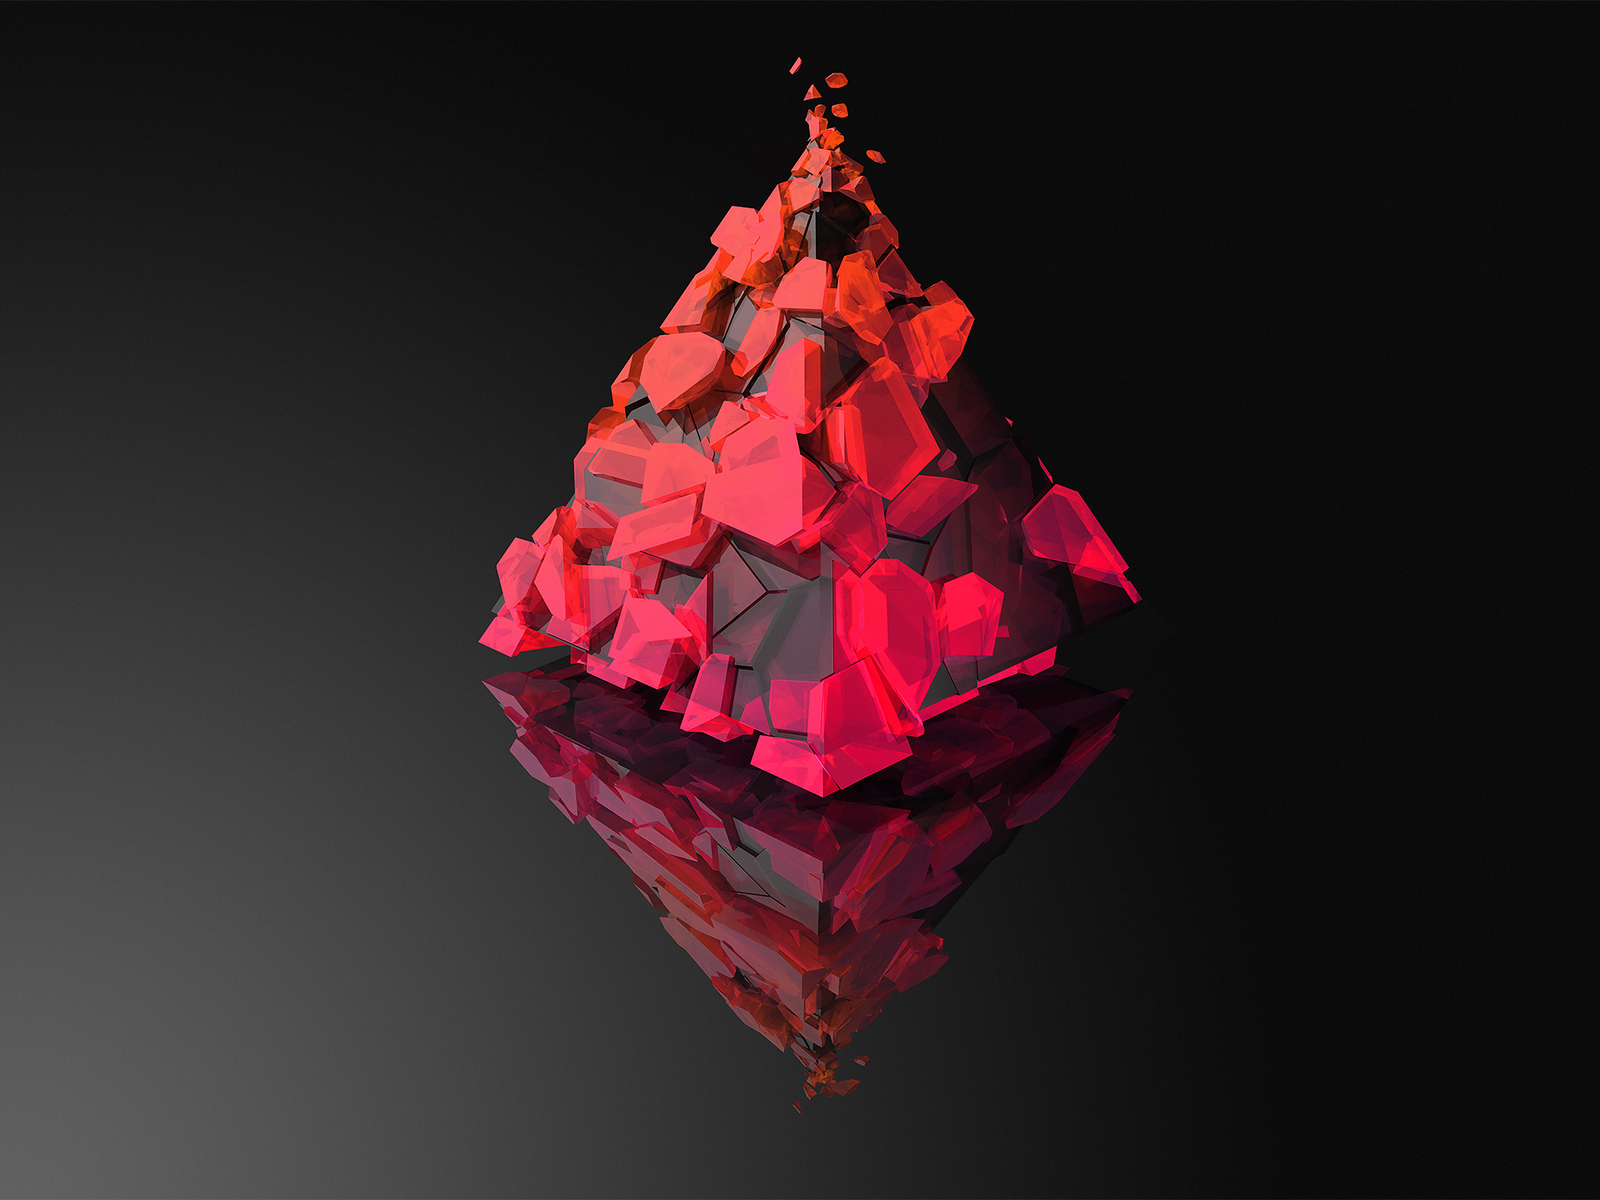 justin-maller-triangle-reflection-3m.jpg